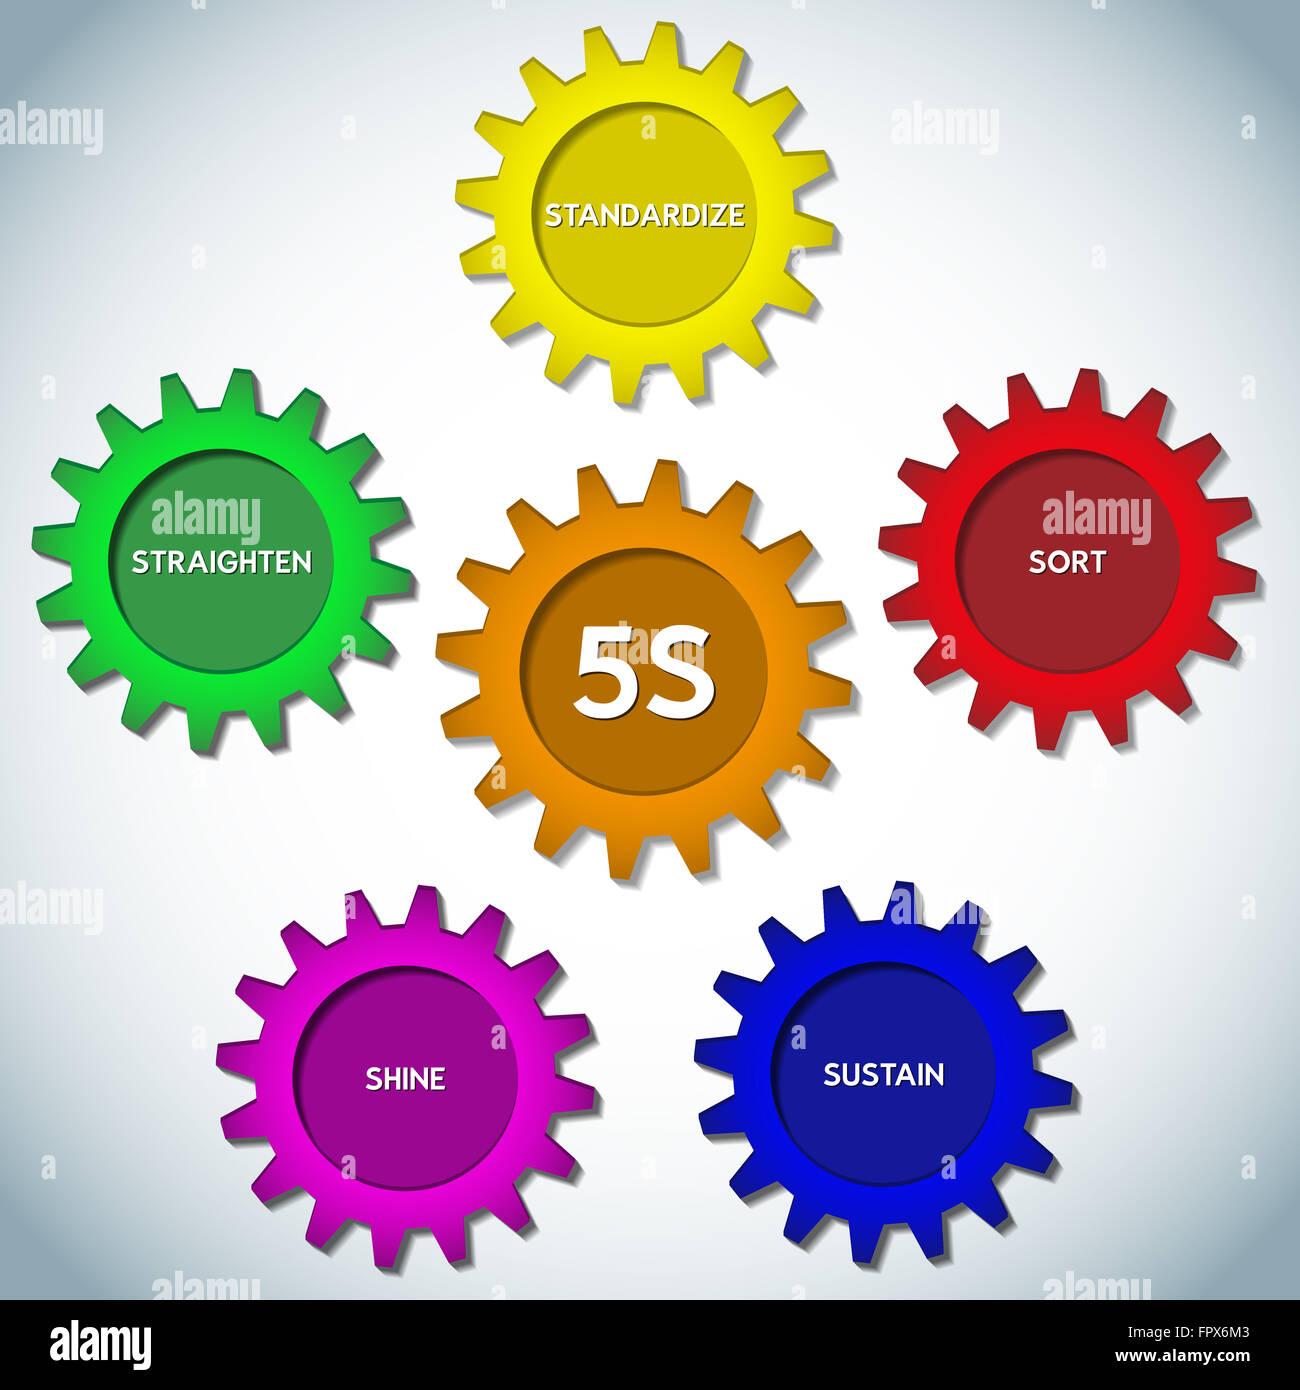 5S. Kaizen Management Methodology. Sort, Straighten, Shine